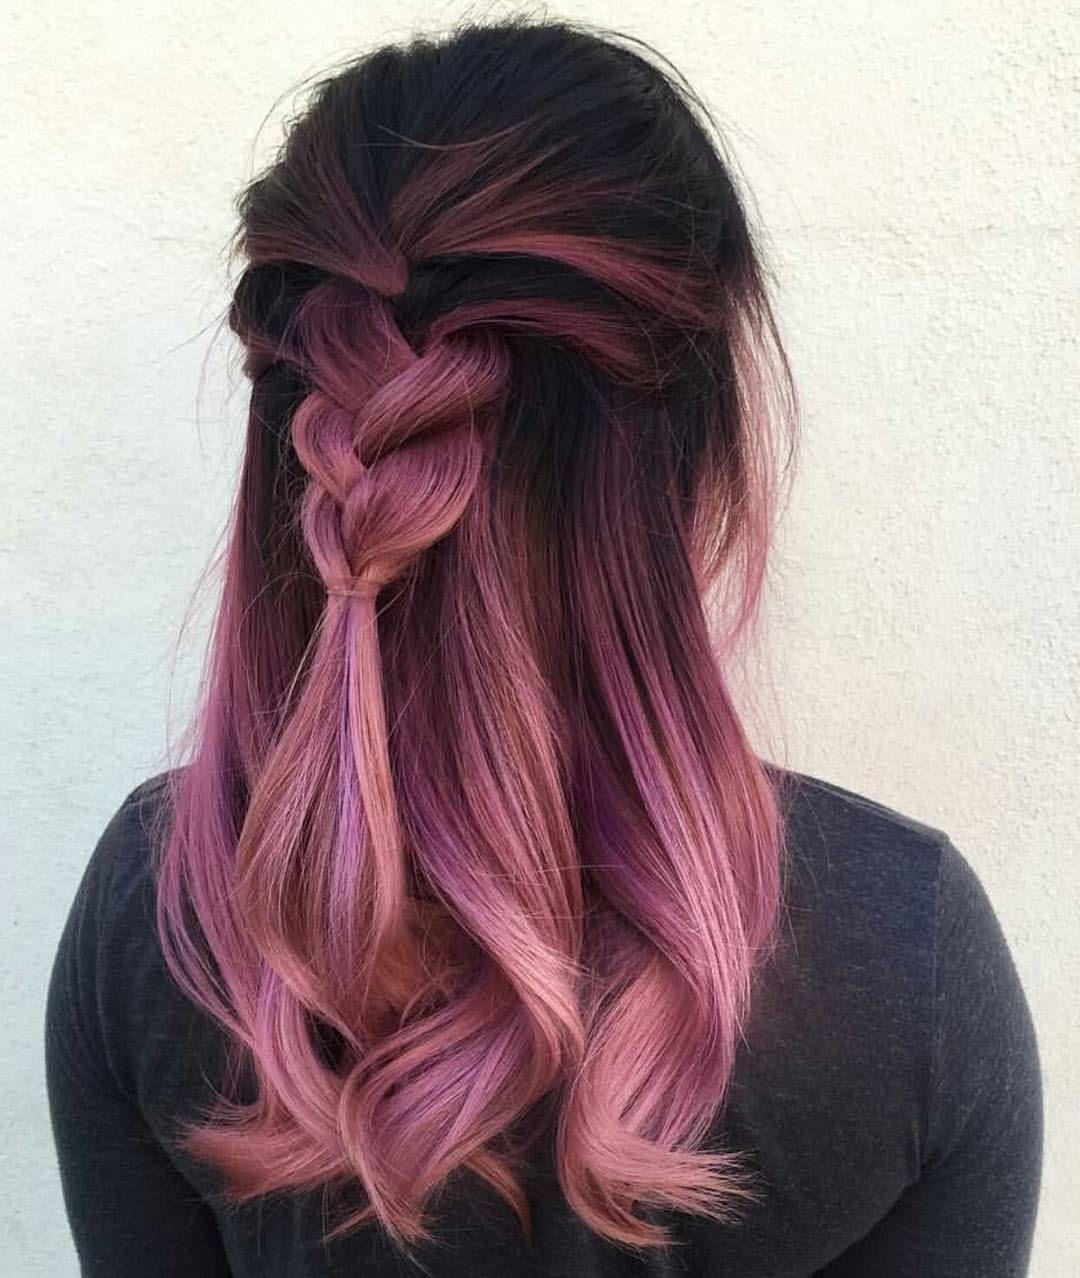 Pin By Kiana Cardenas On Hairstyle Pinterest Hair Hair Styles